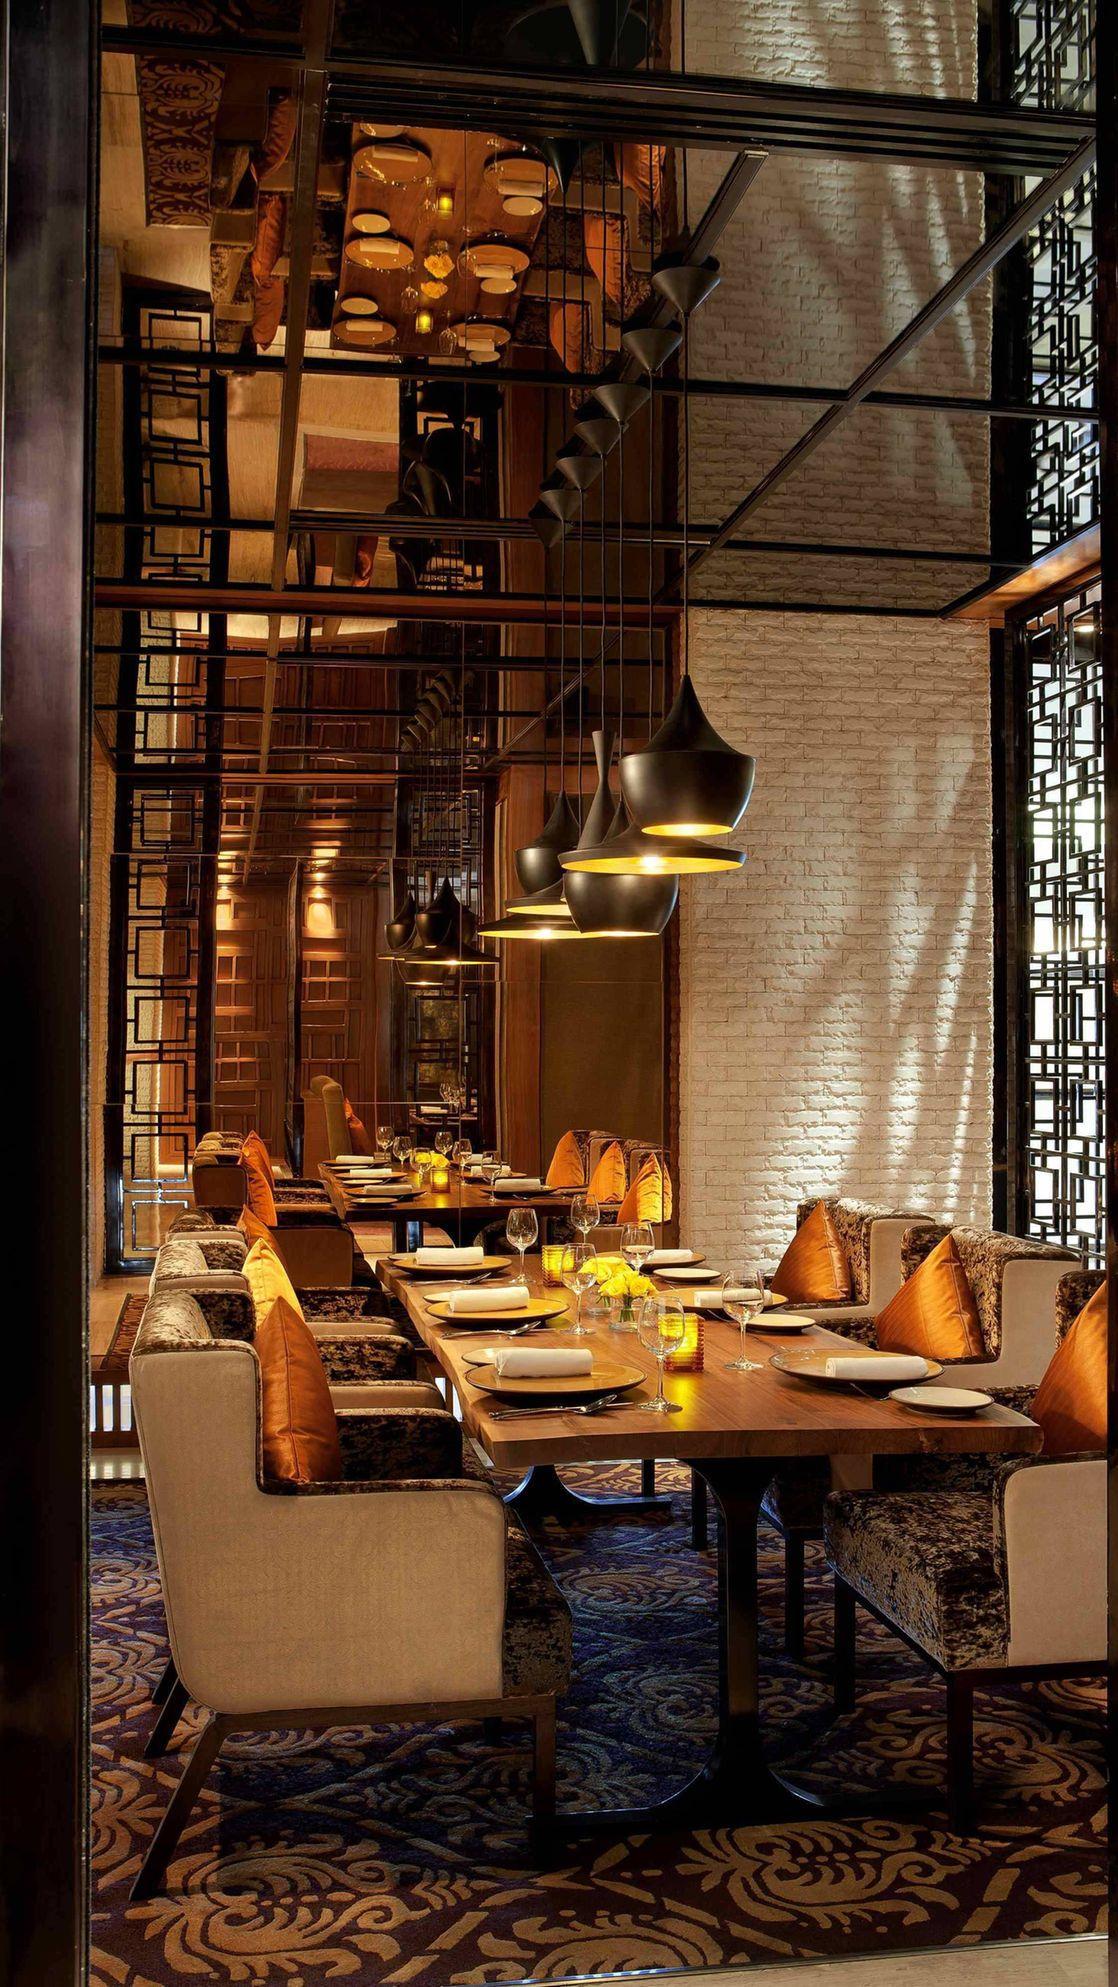 Saffron Private Dining In Chandigarh